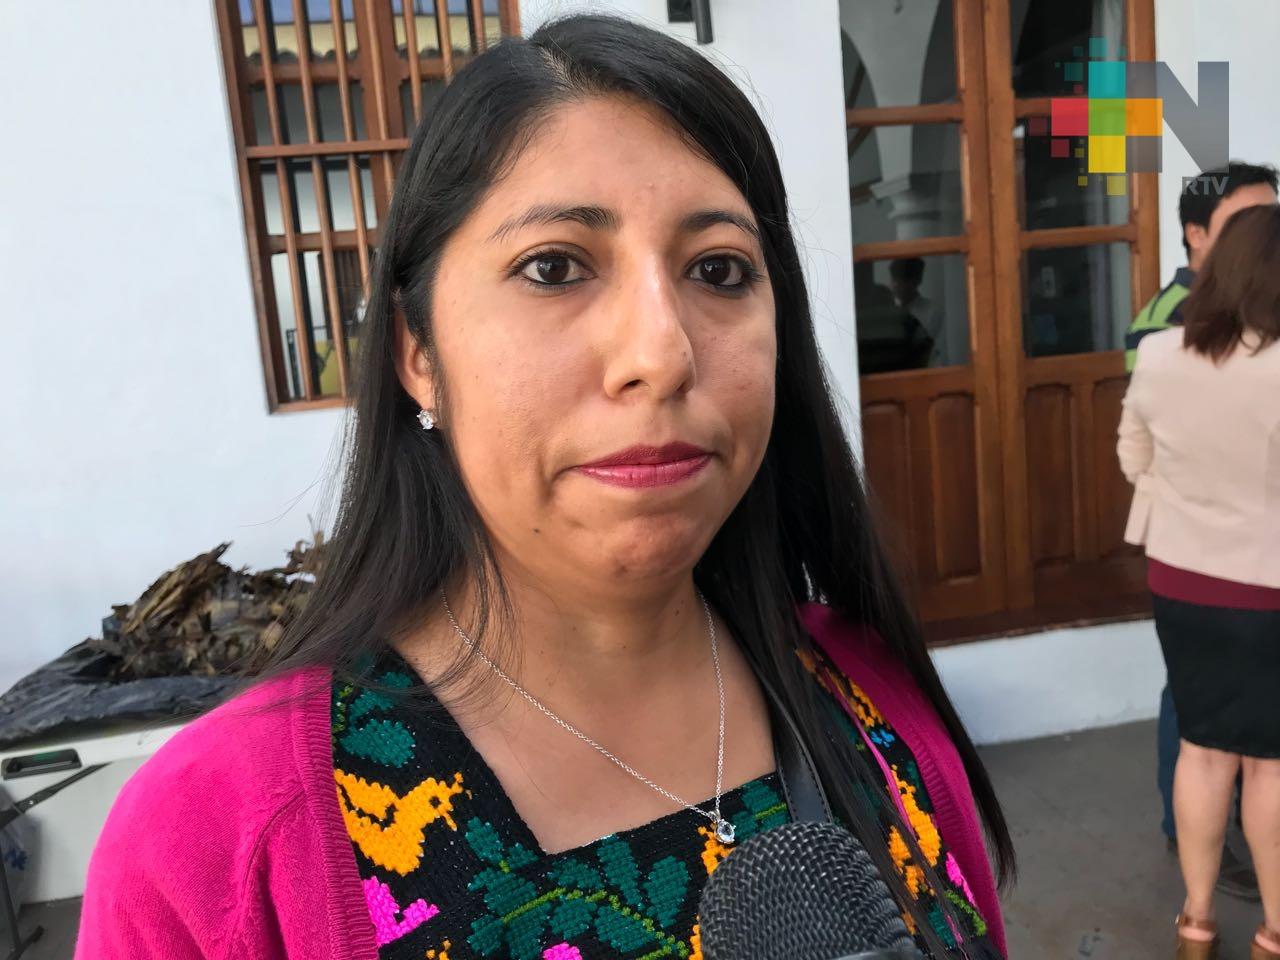 Aveli certificará a hablantes de la lengua Tepehua en Tlachichilco